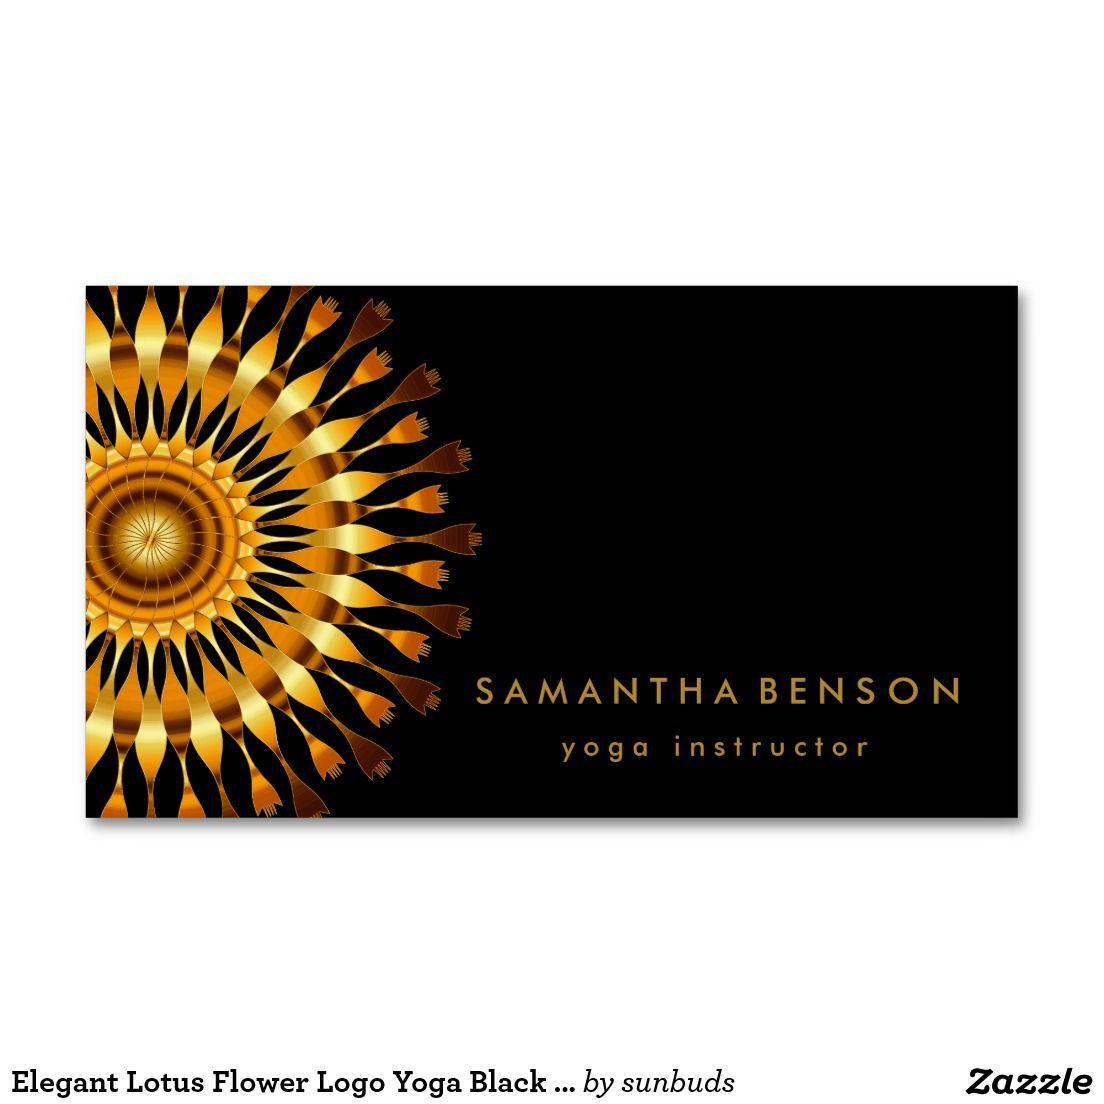 Elegant Lotus Flower Logo Yoga Black Background Business Card ...